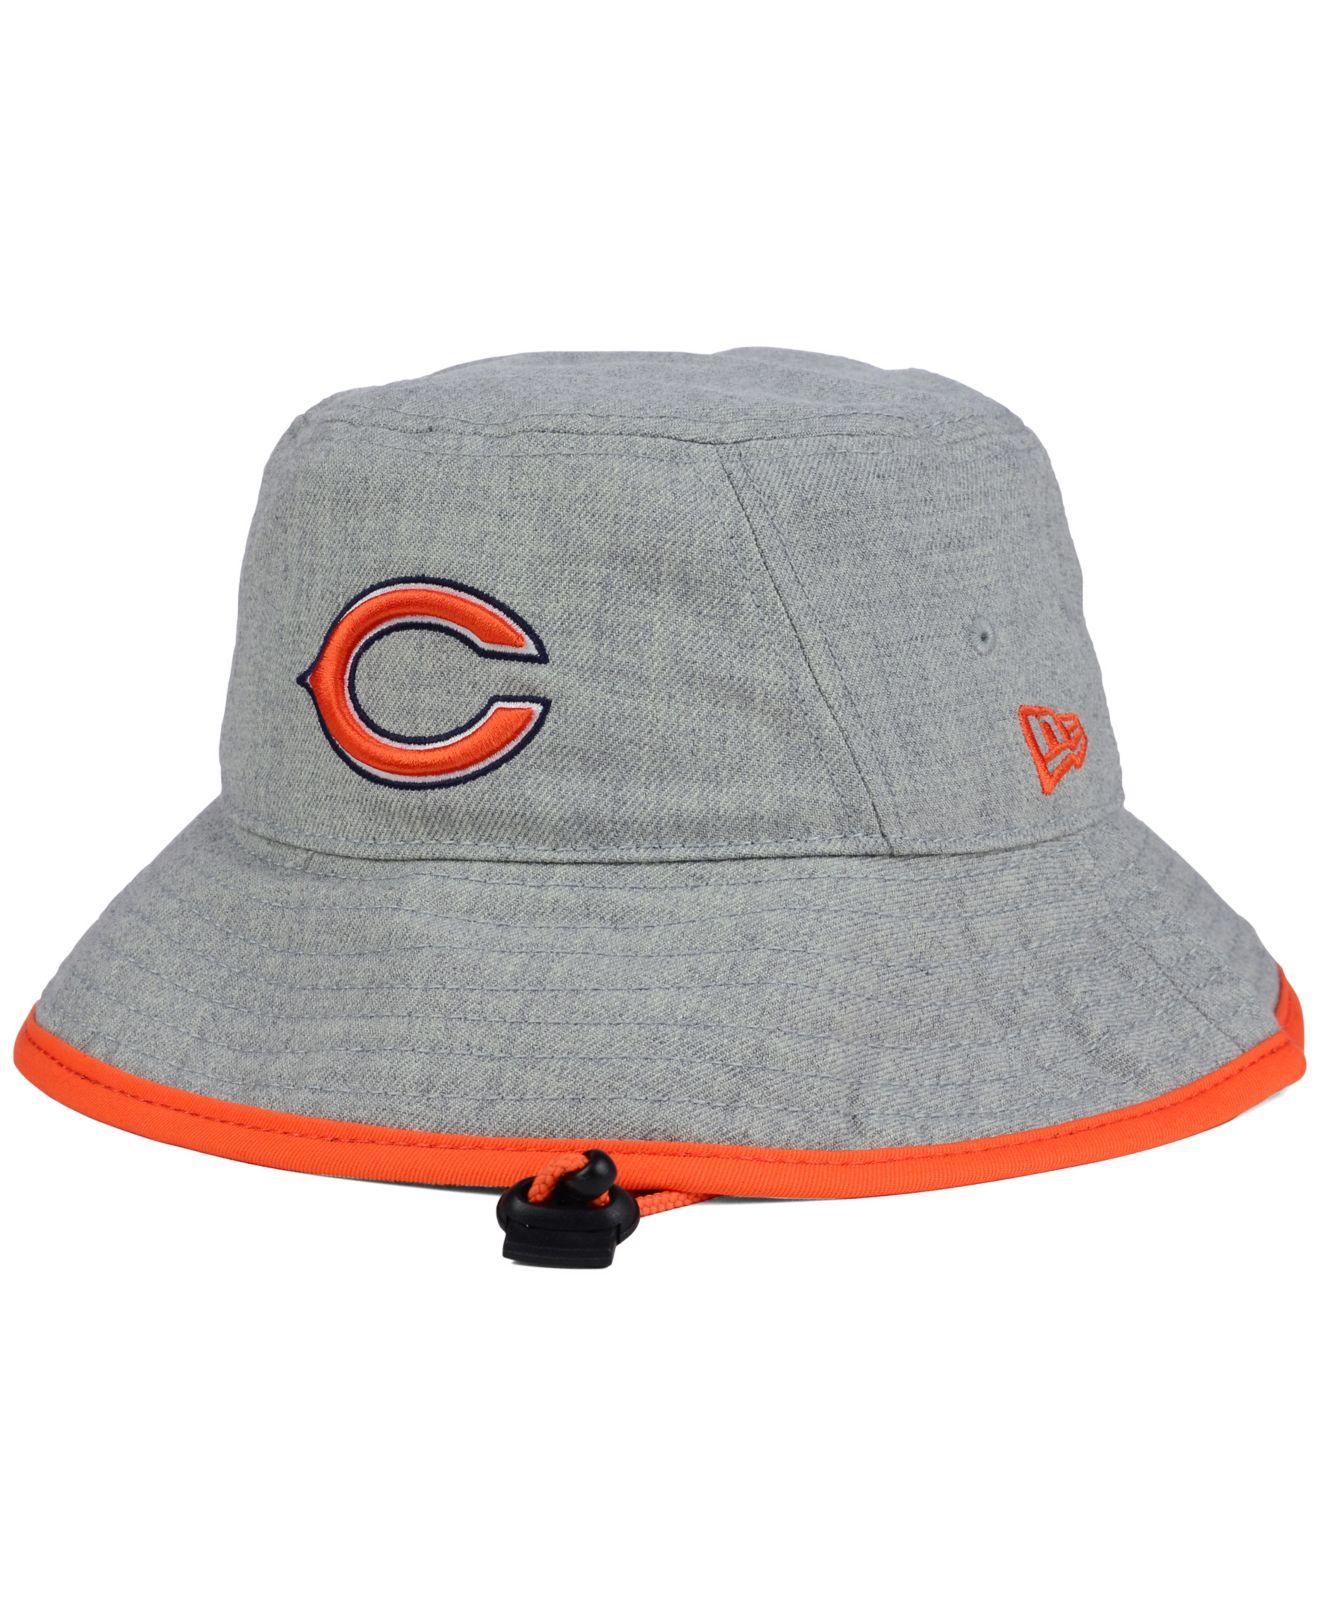 f3ba86d1aa58d KTZ Chicago Bears Nfl Heather Gray Bucket Hat in Gray for Men - Lyst